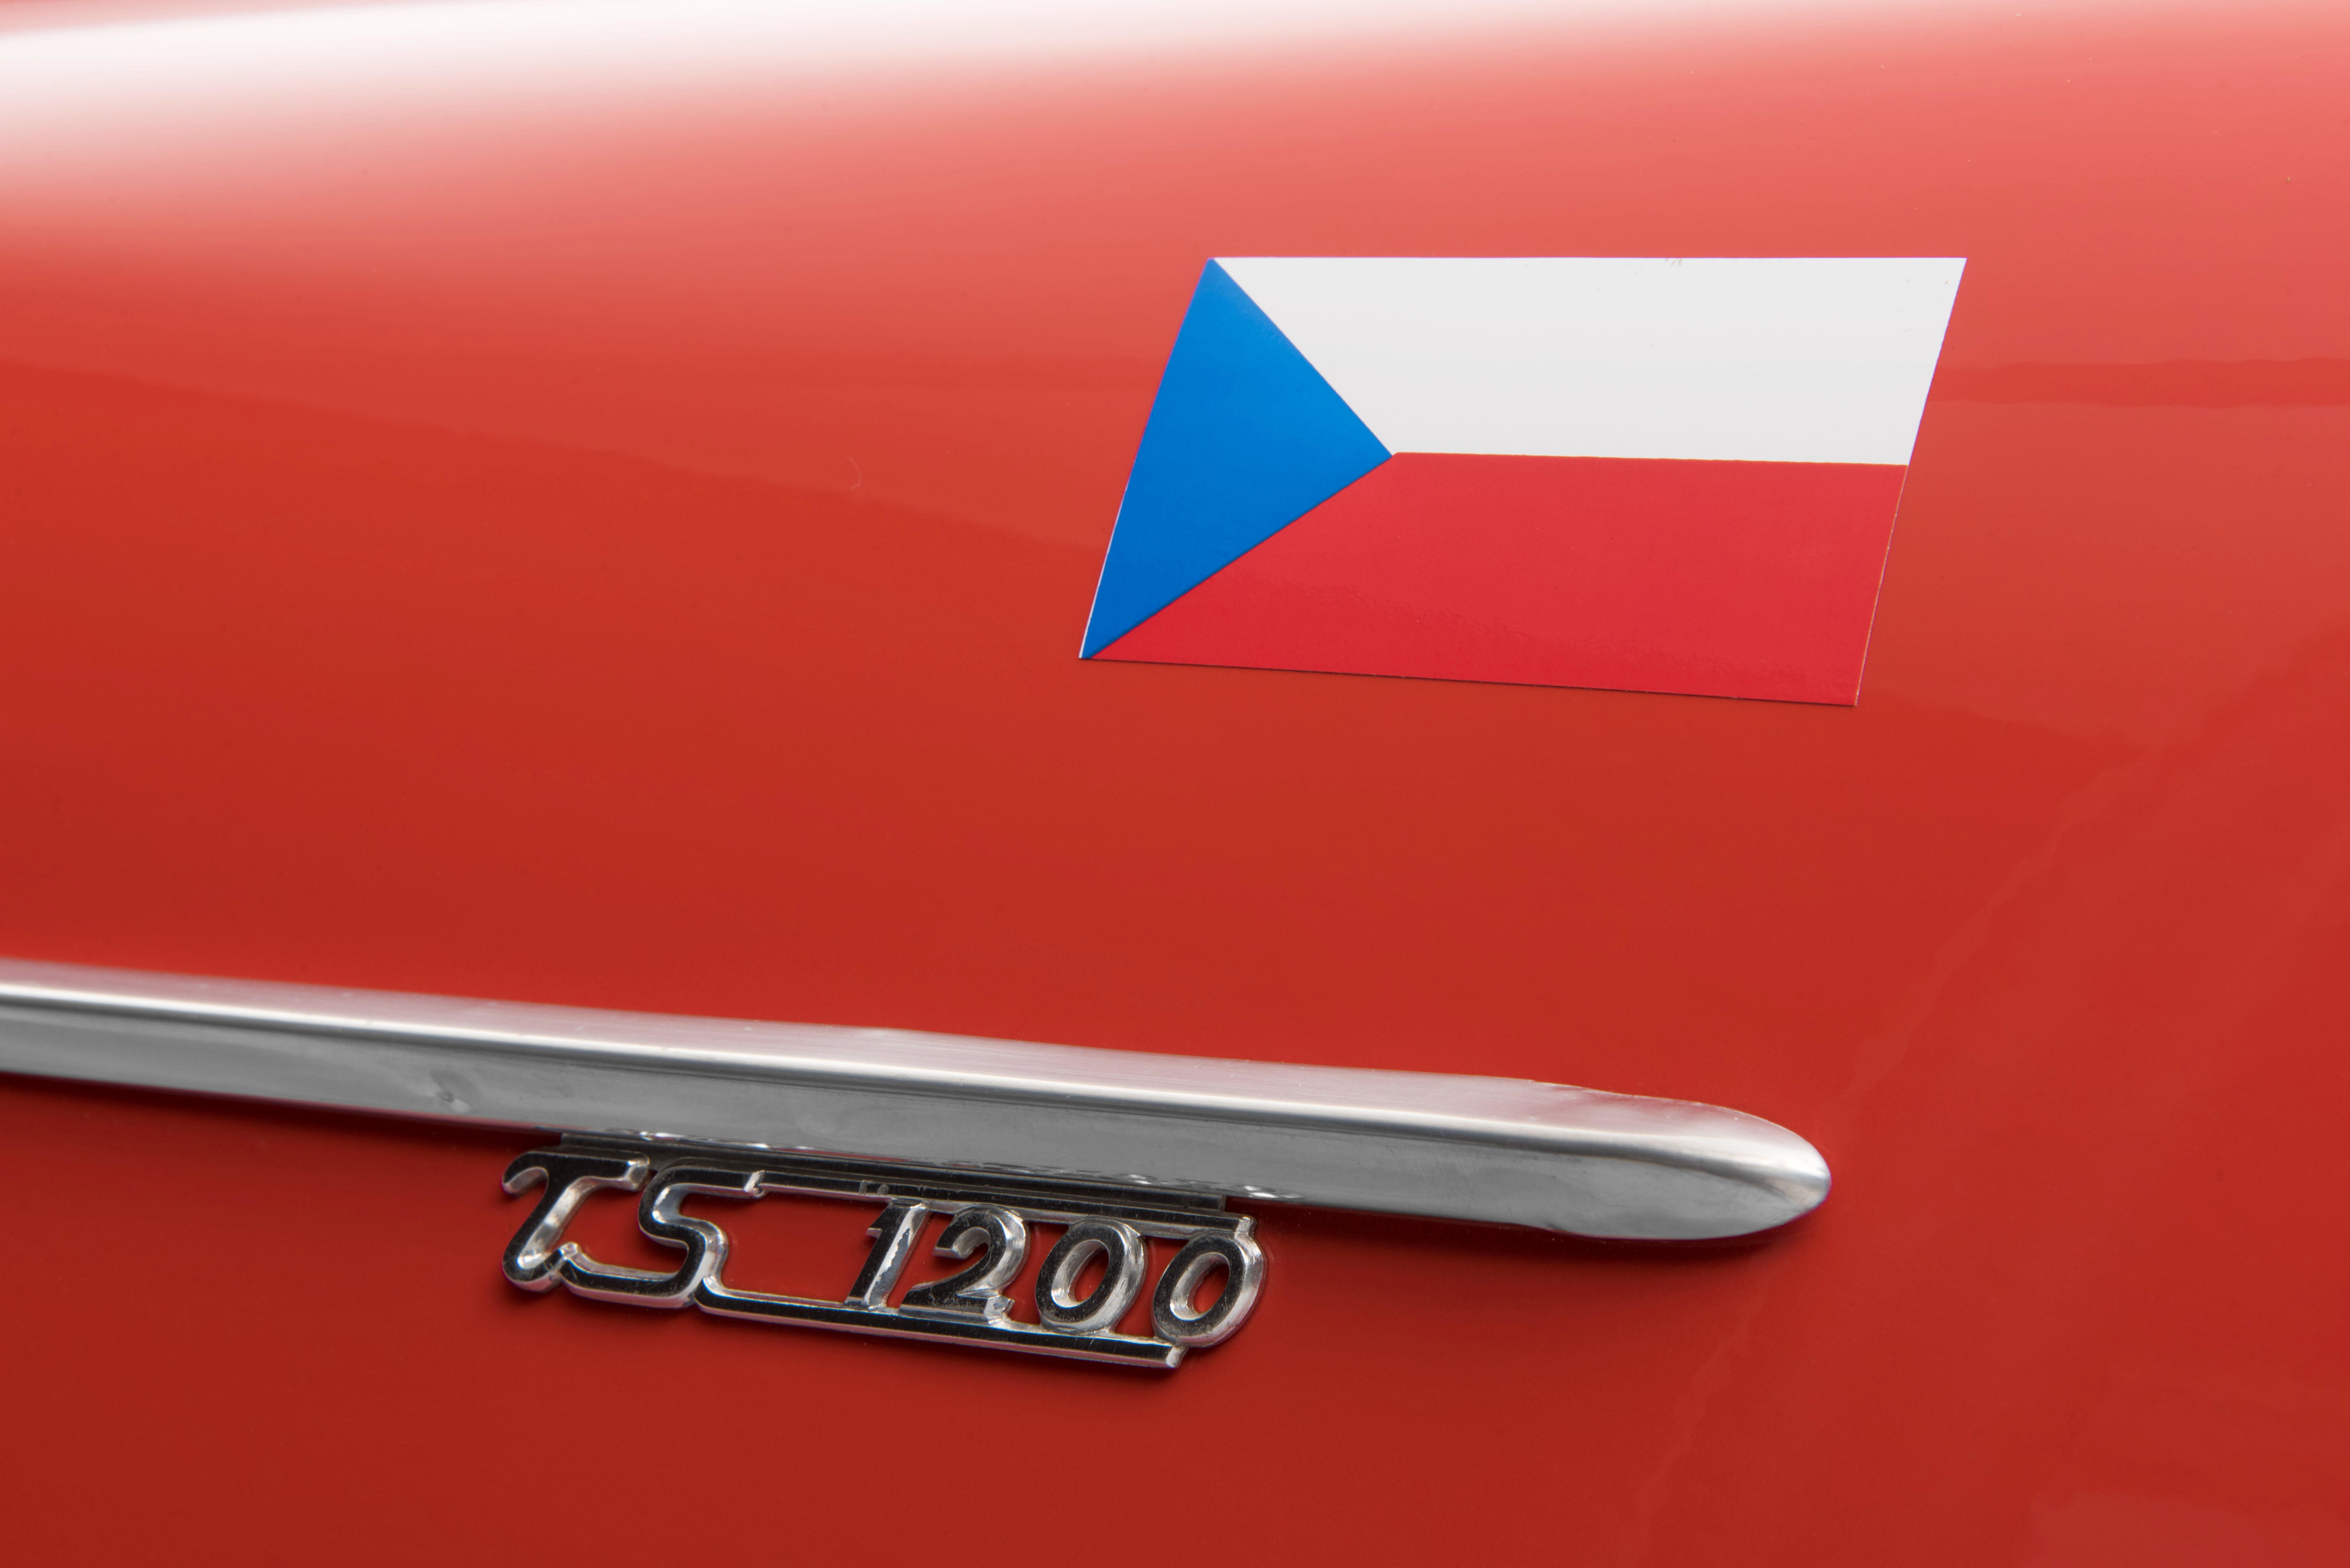 SKODA OCTAVIA TOURING SPORT (1960): Successful return to international rally courses - Image 4